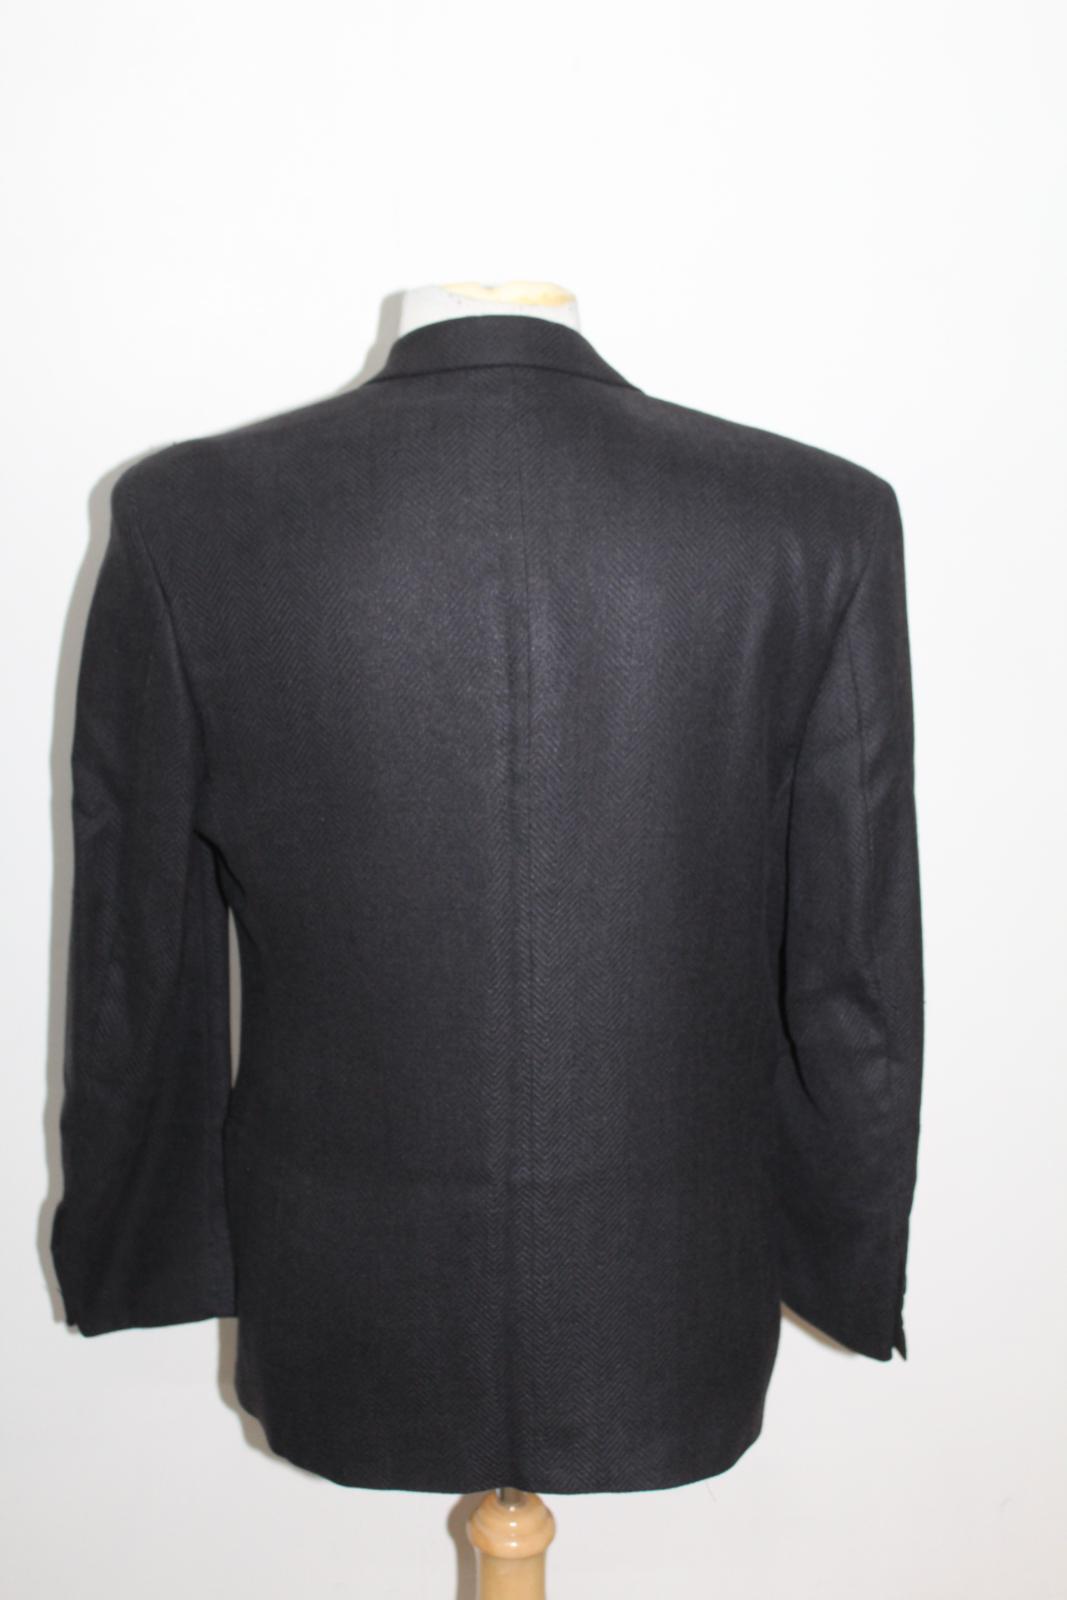 Hugo-Boss-Para-Hombre-Azul-Marino-Herringbone-Doble-Abotonadura-Blazer-Chaqueta-UK42-L miniatura 5